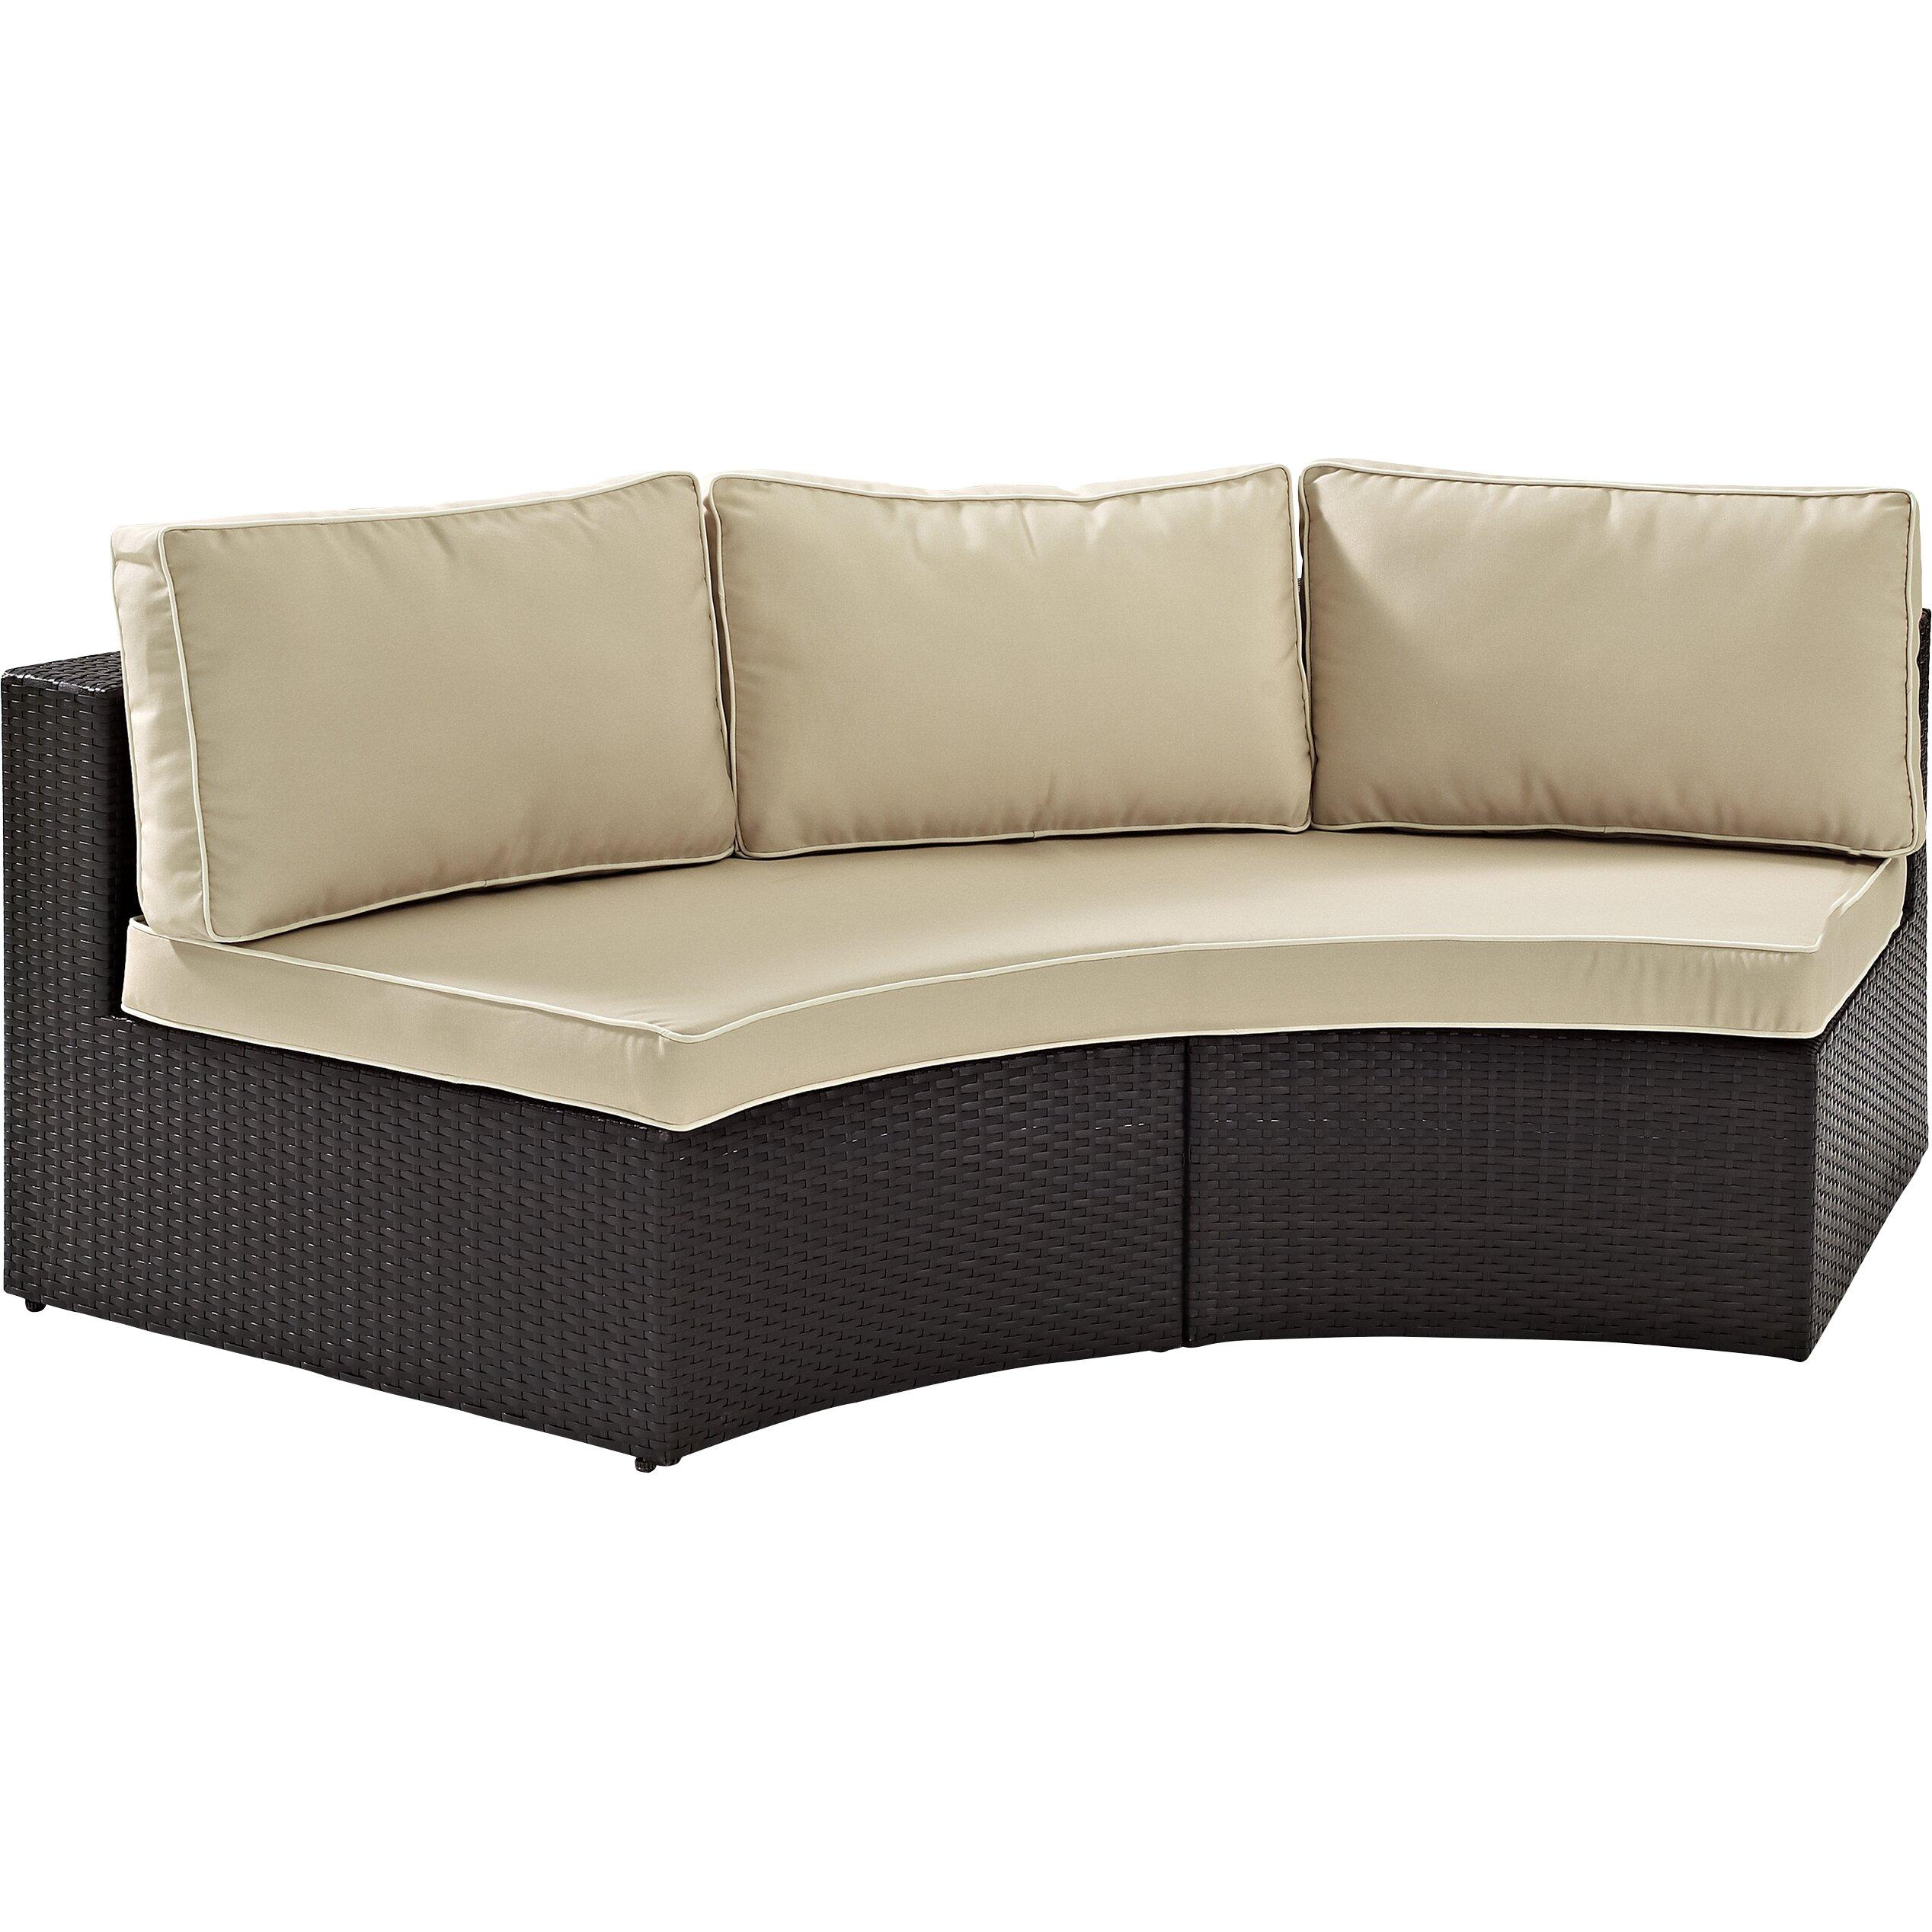 Mercury row cleopatra sofa with cushions reviews for Cleopatra sofa bed